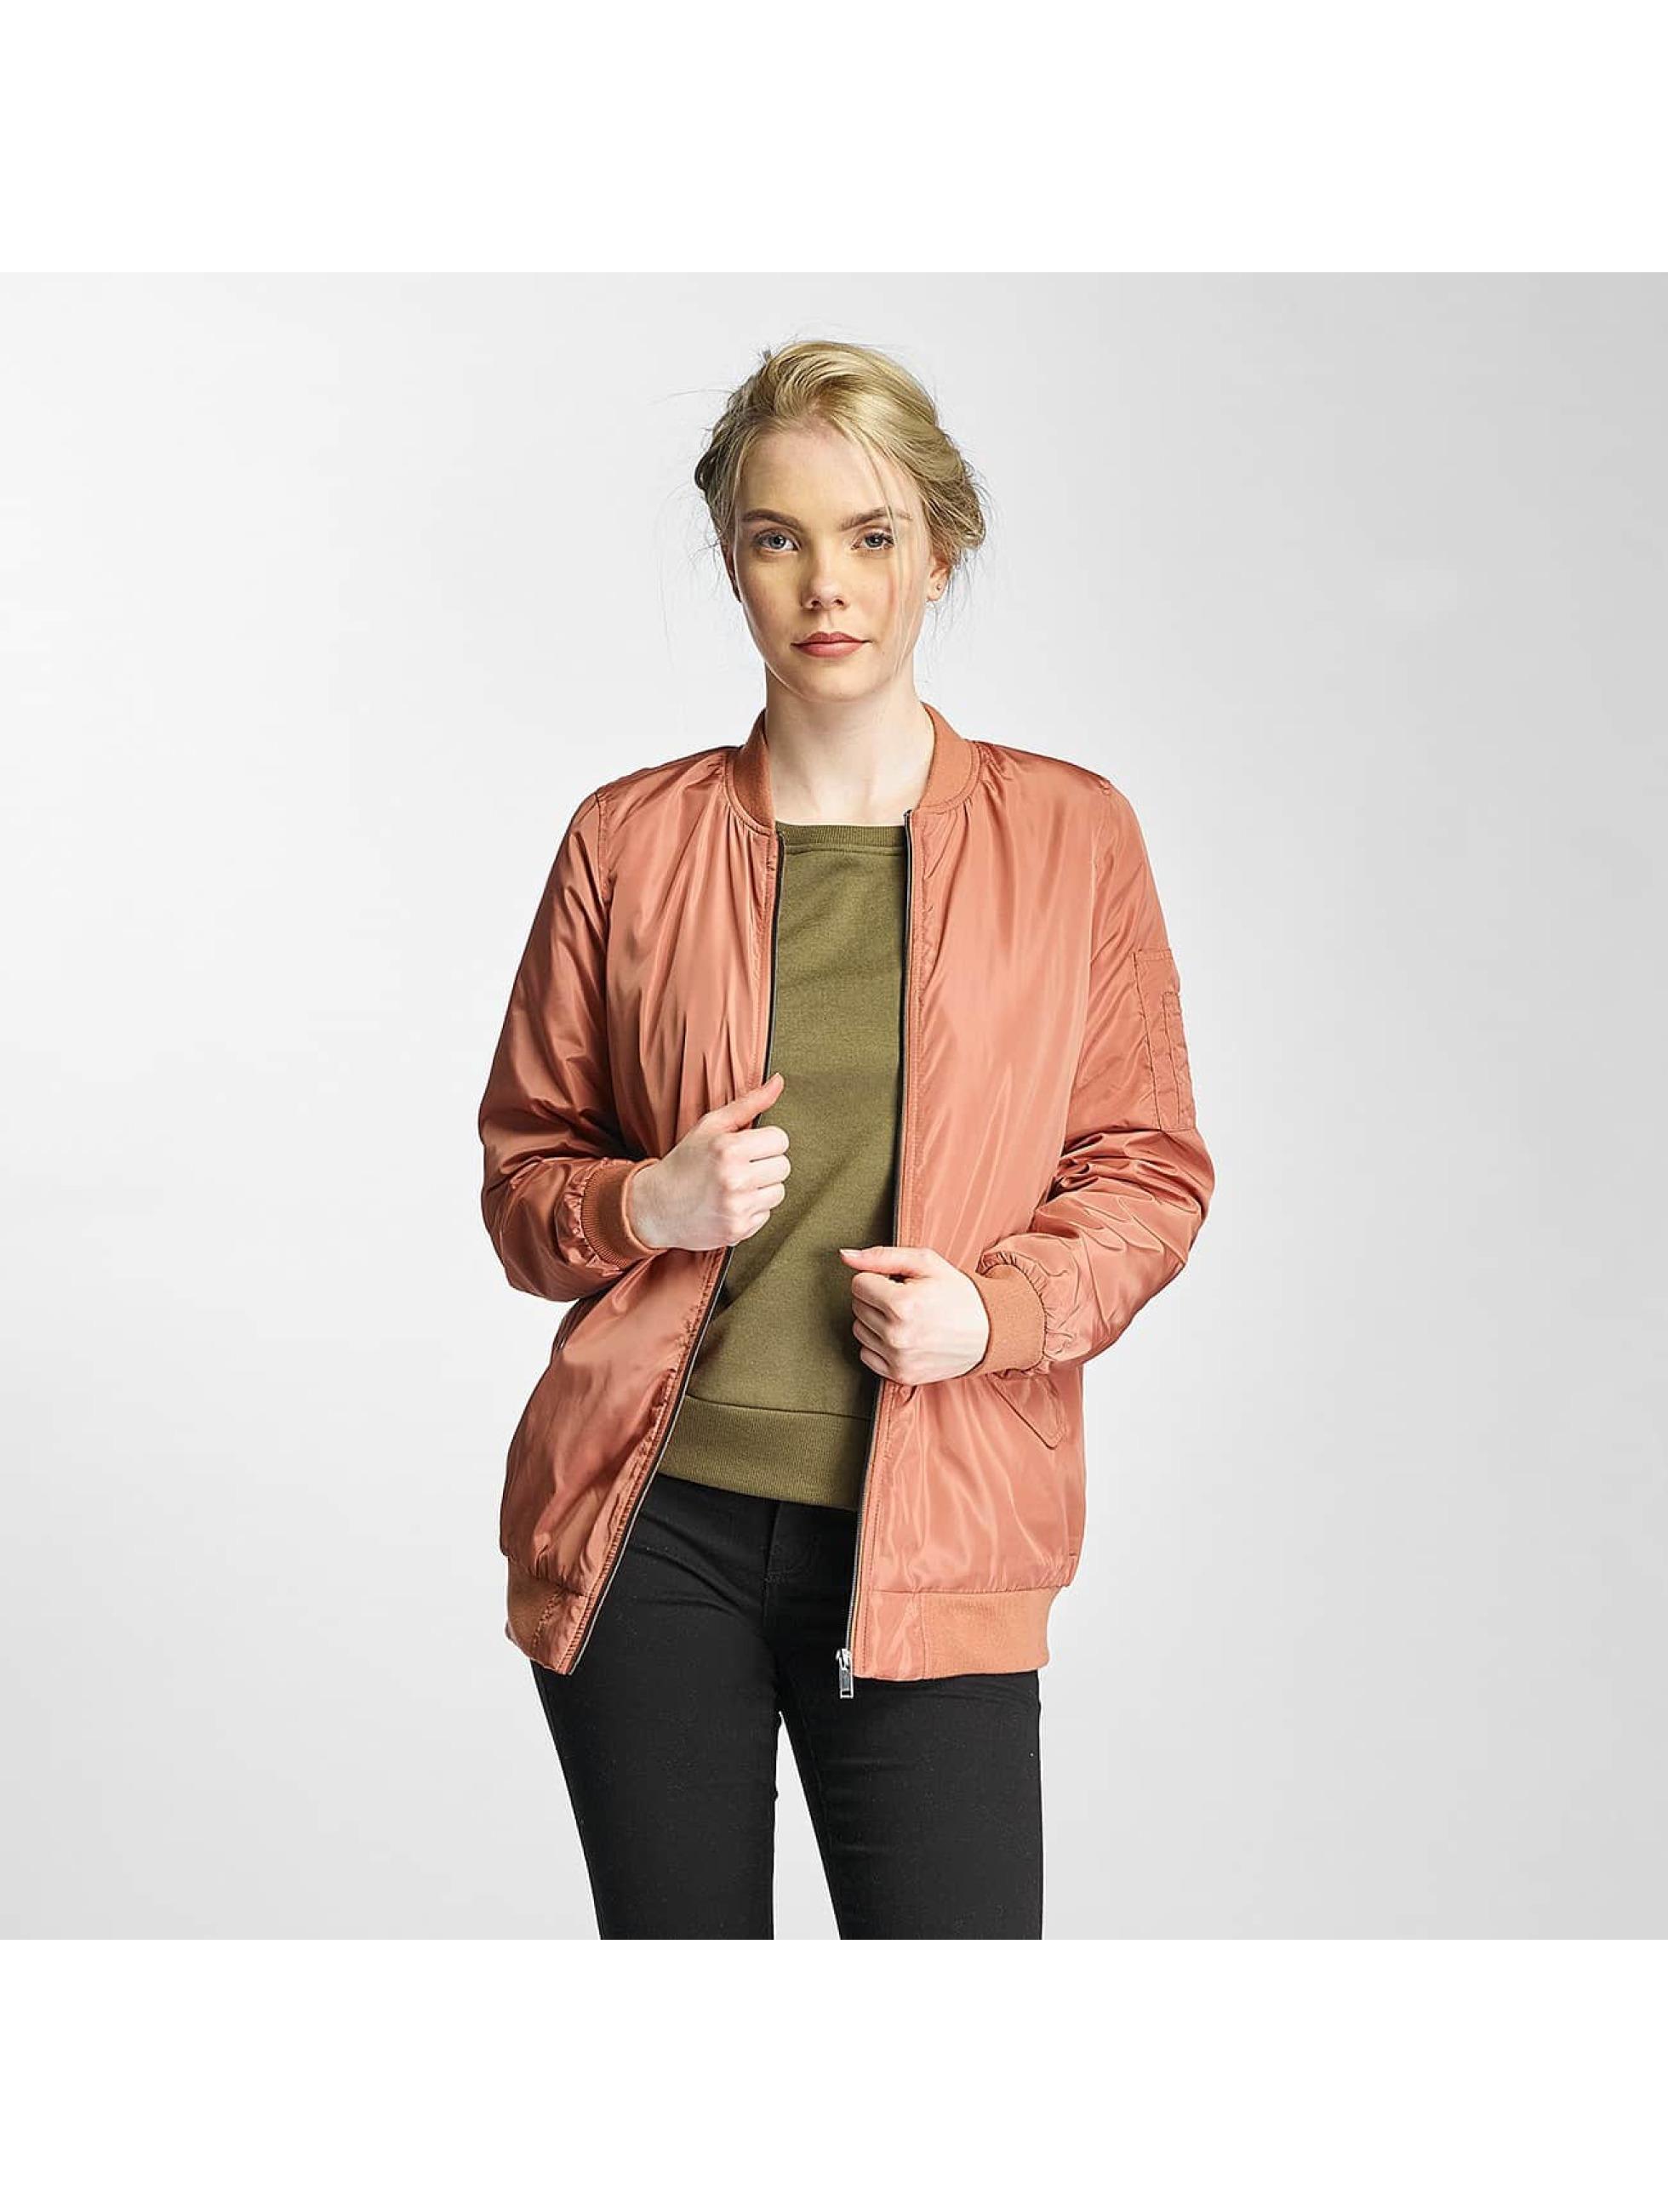 Schmogrow-Fehrow Angebote Vero Moda Frauen Bomberjacke VMElina in rot